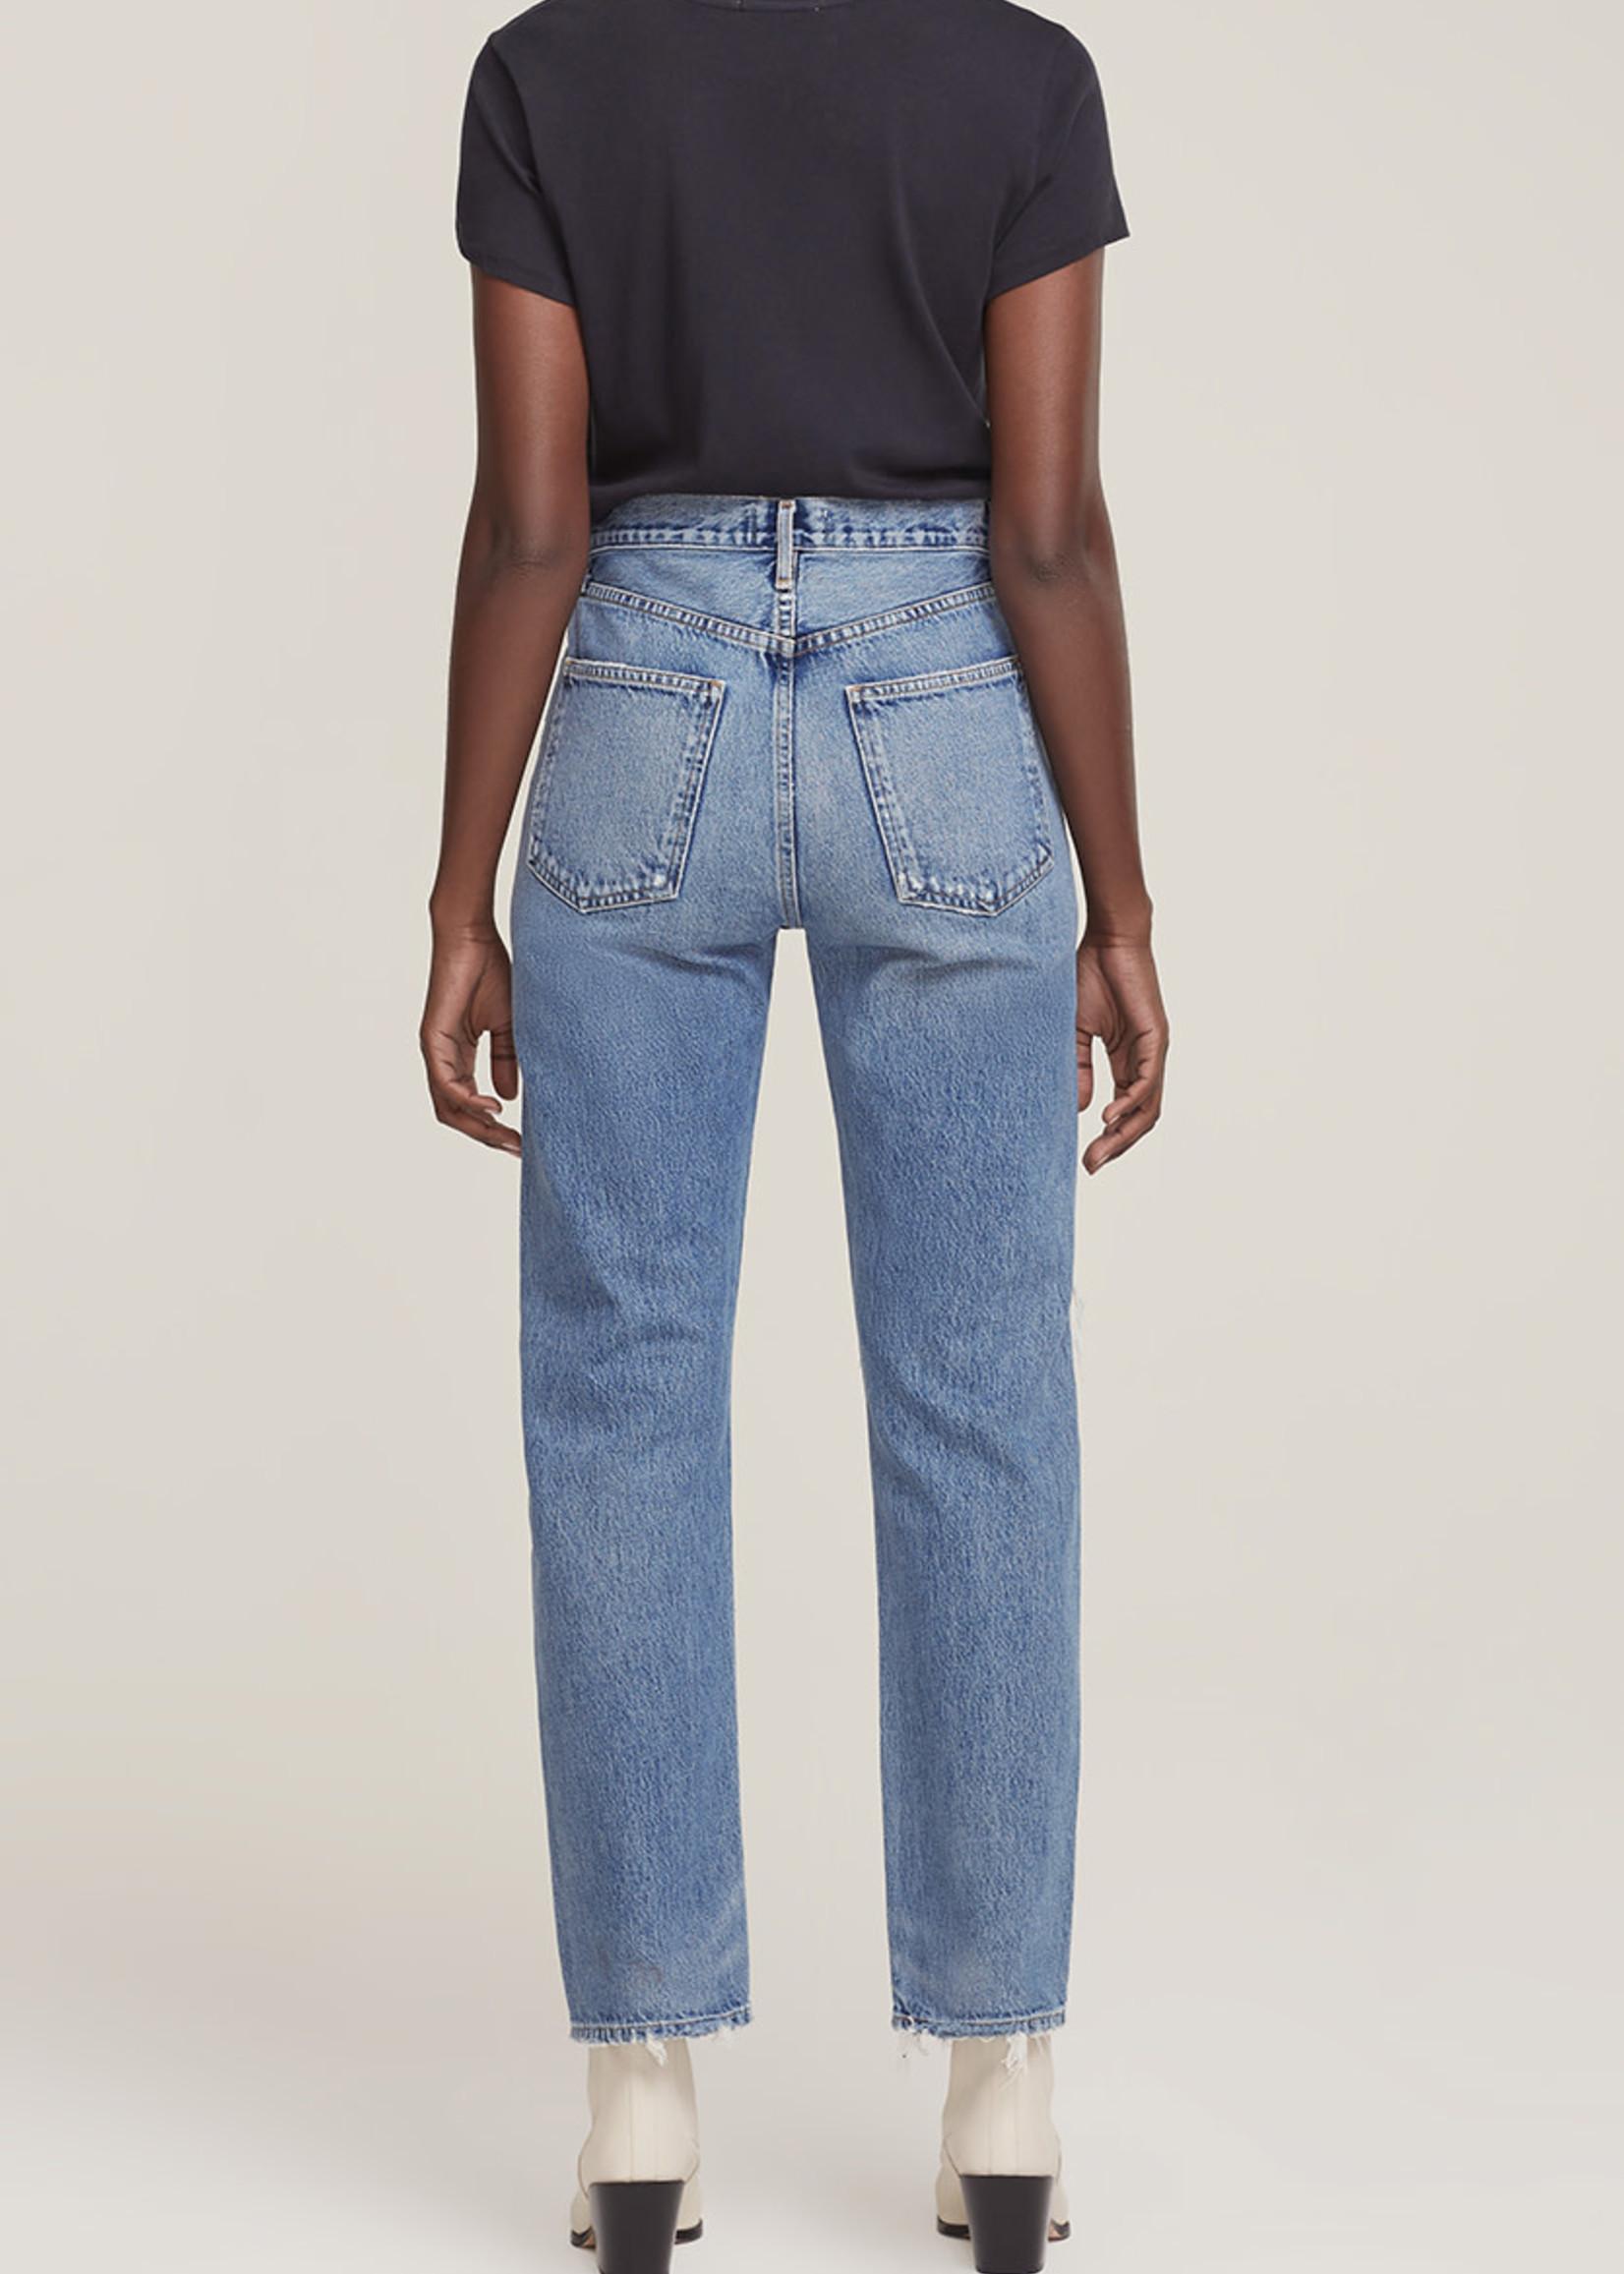 AGOLDE 90's Pinch Waist Jean in Lineup